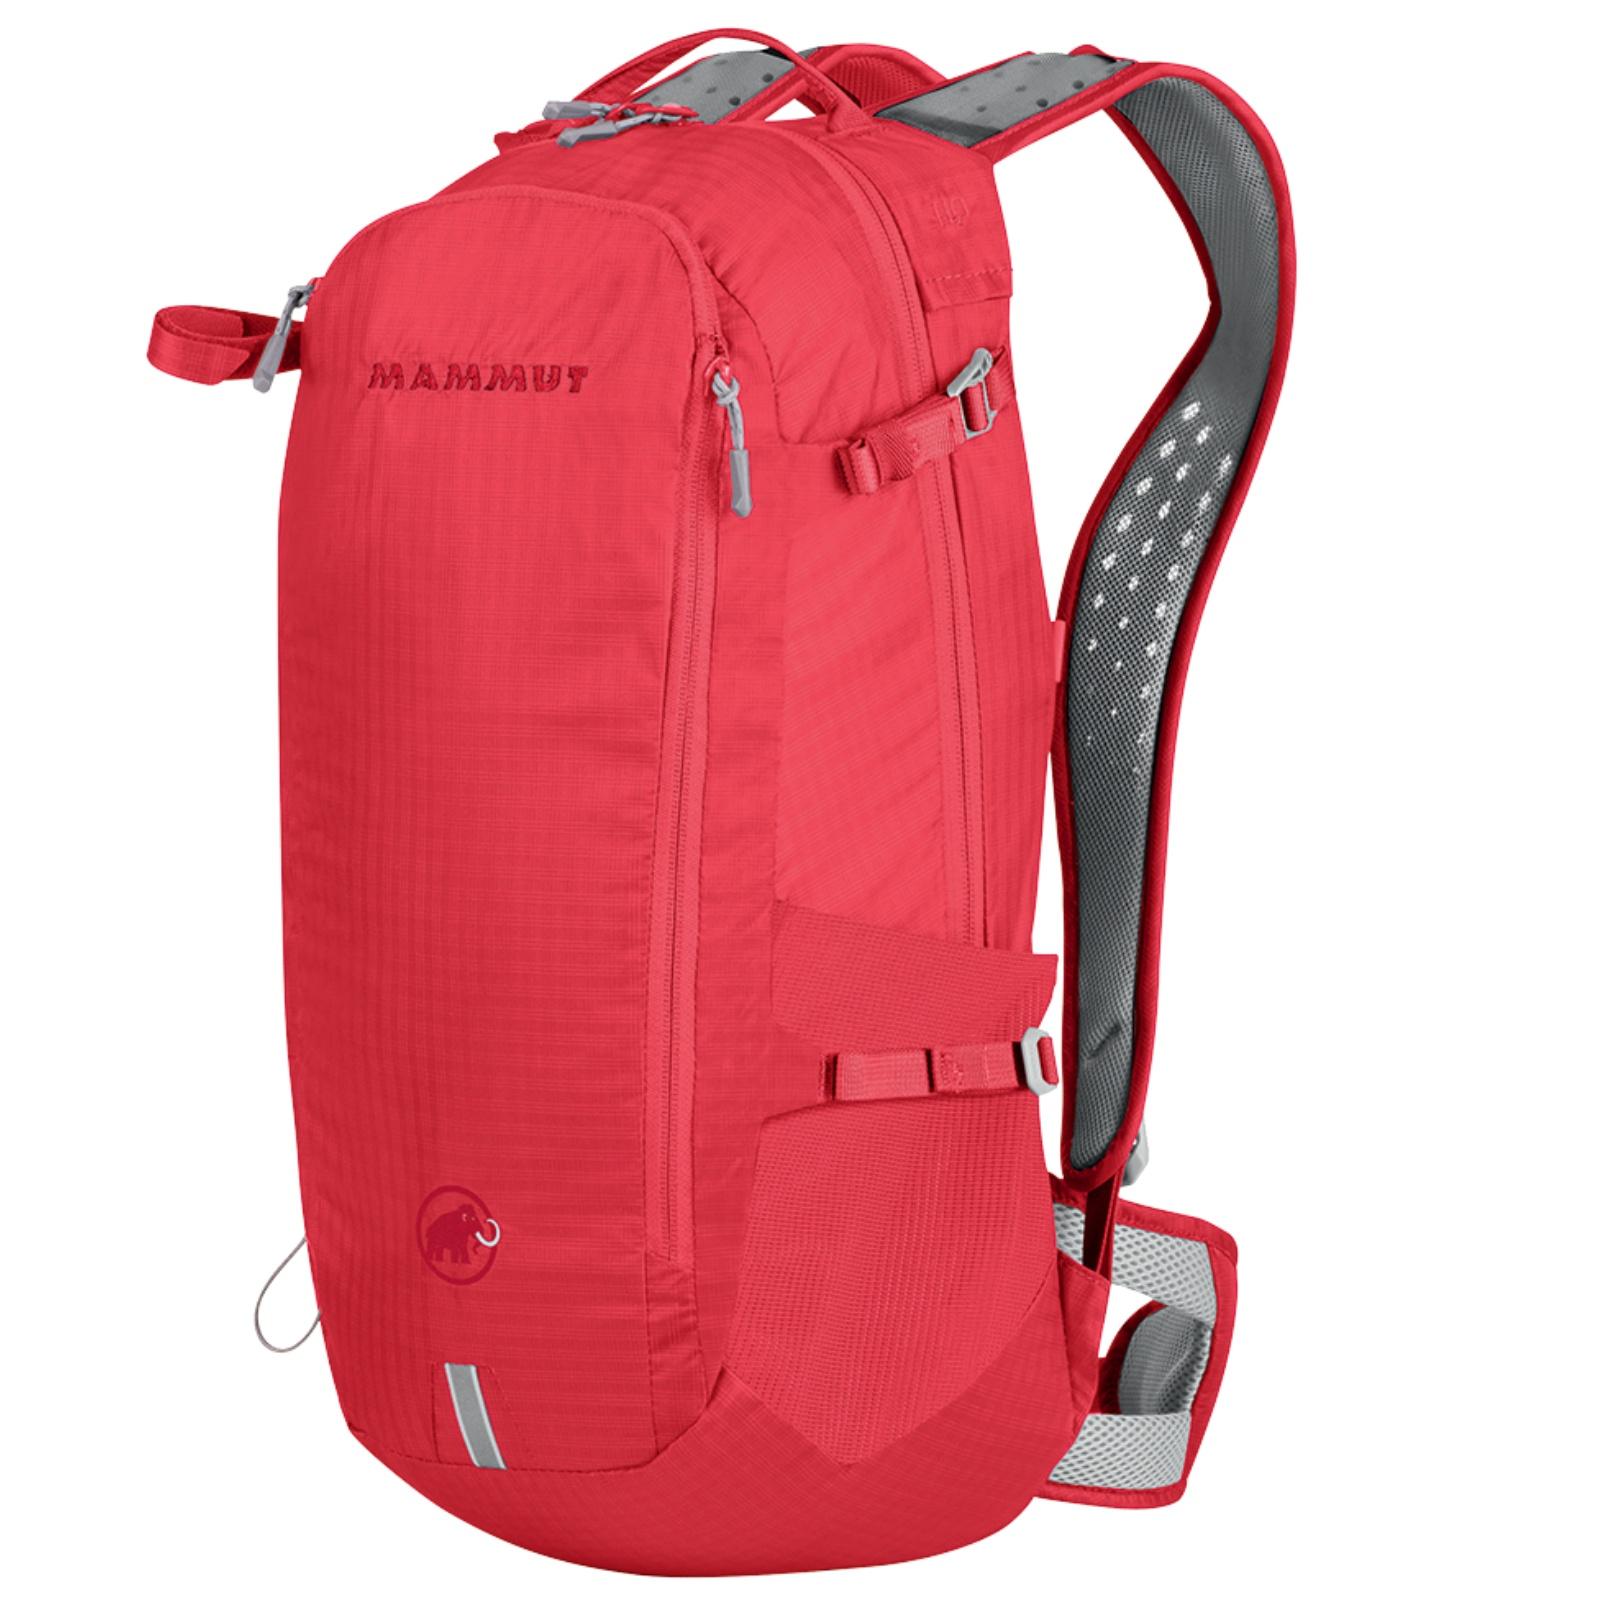 Outdoorový batoh MAMMUT Lithium Speed 20 - červený